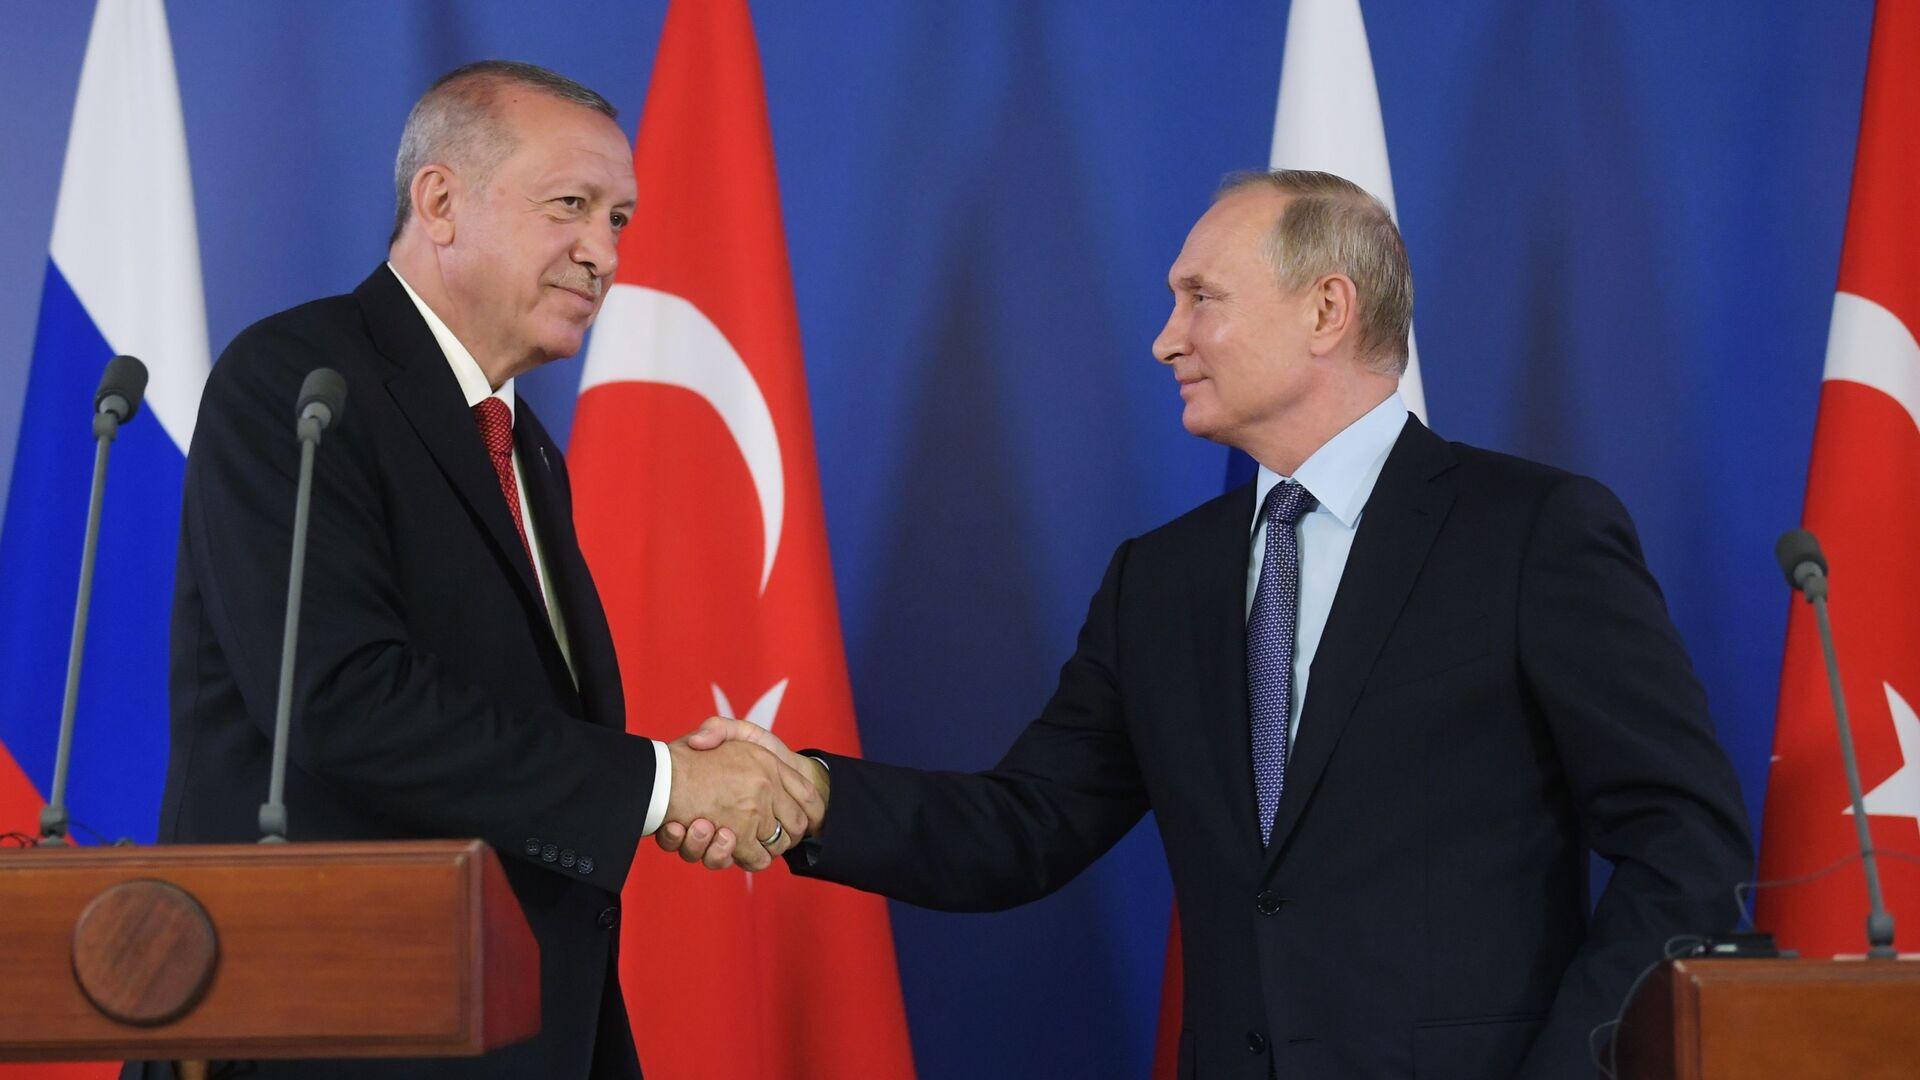 Президент РФ В. Путин и президент Турции Р. Т. Эрдоган посетили авиасалон МАКС 2019 - Sputnik Mundo, 1920, 21.08.2021